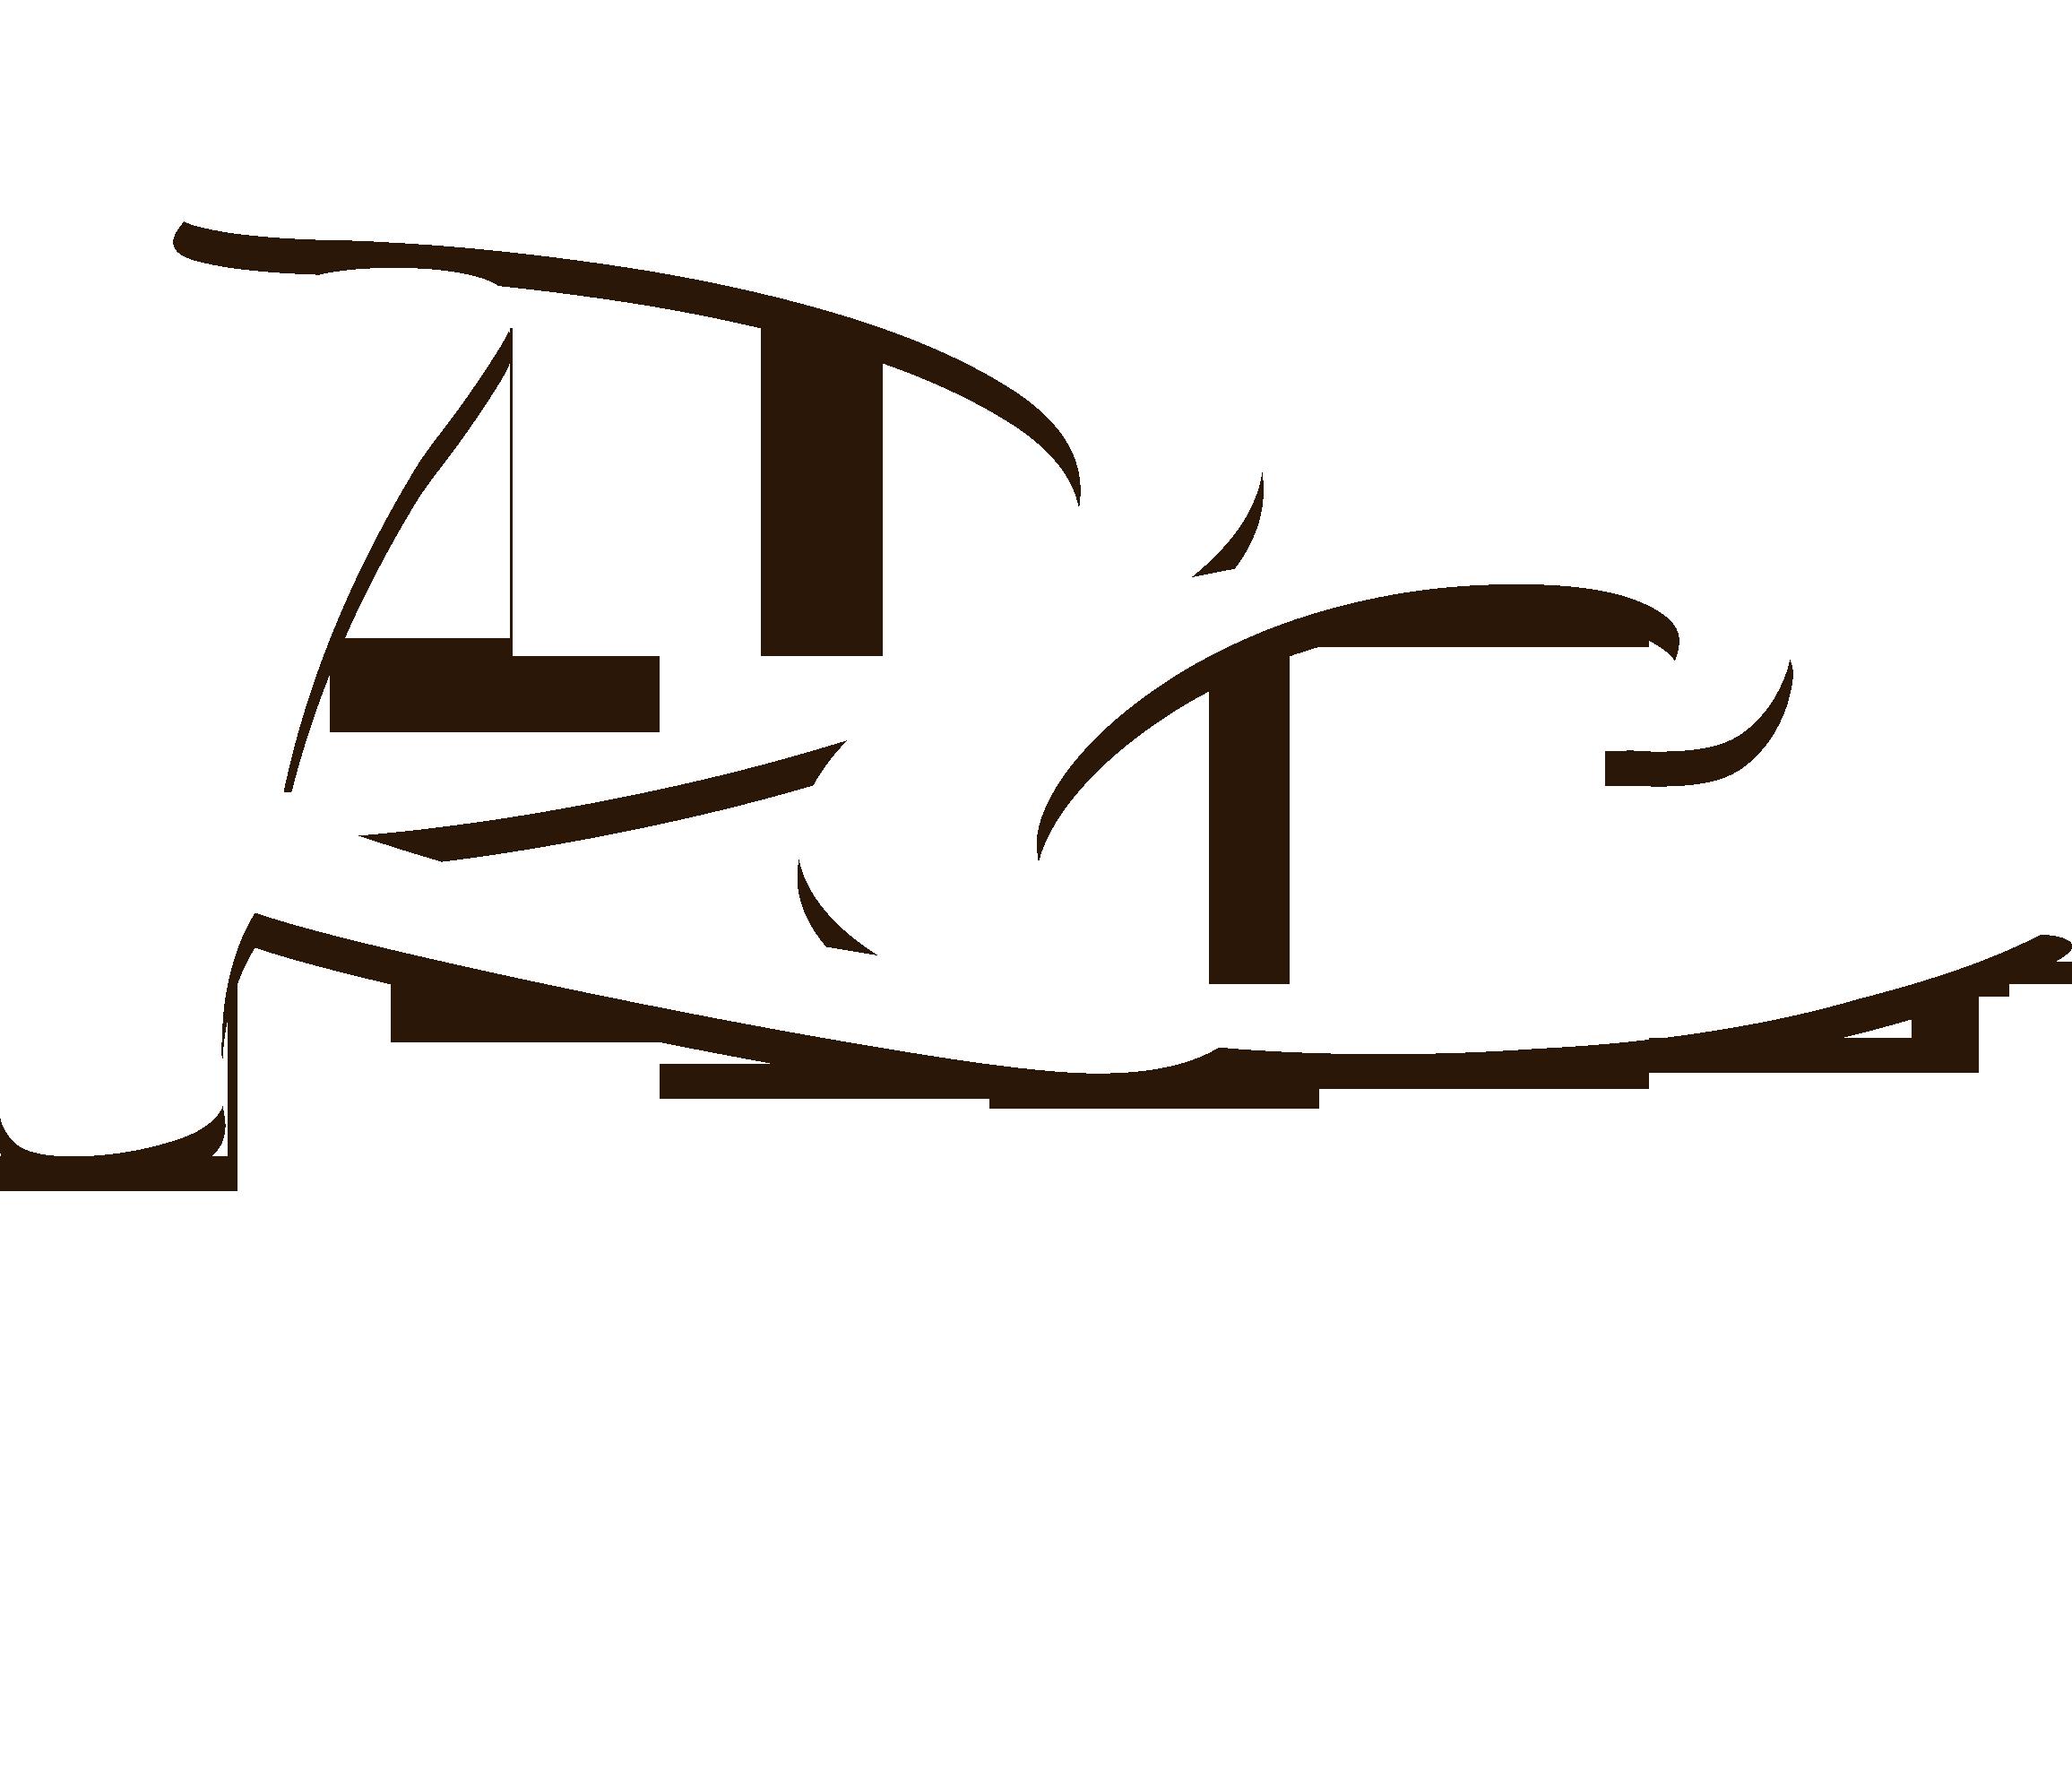 ronnycrissmusic.com